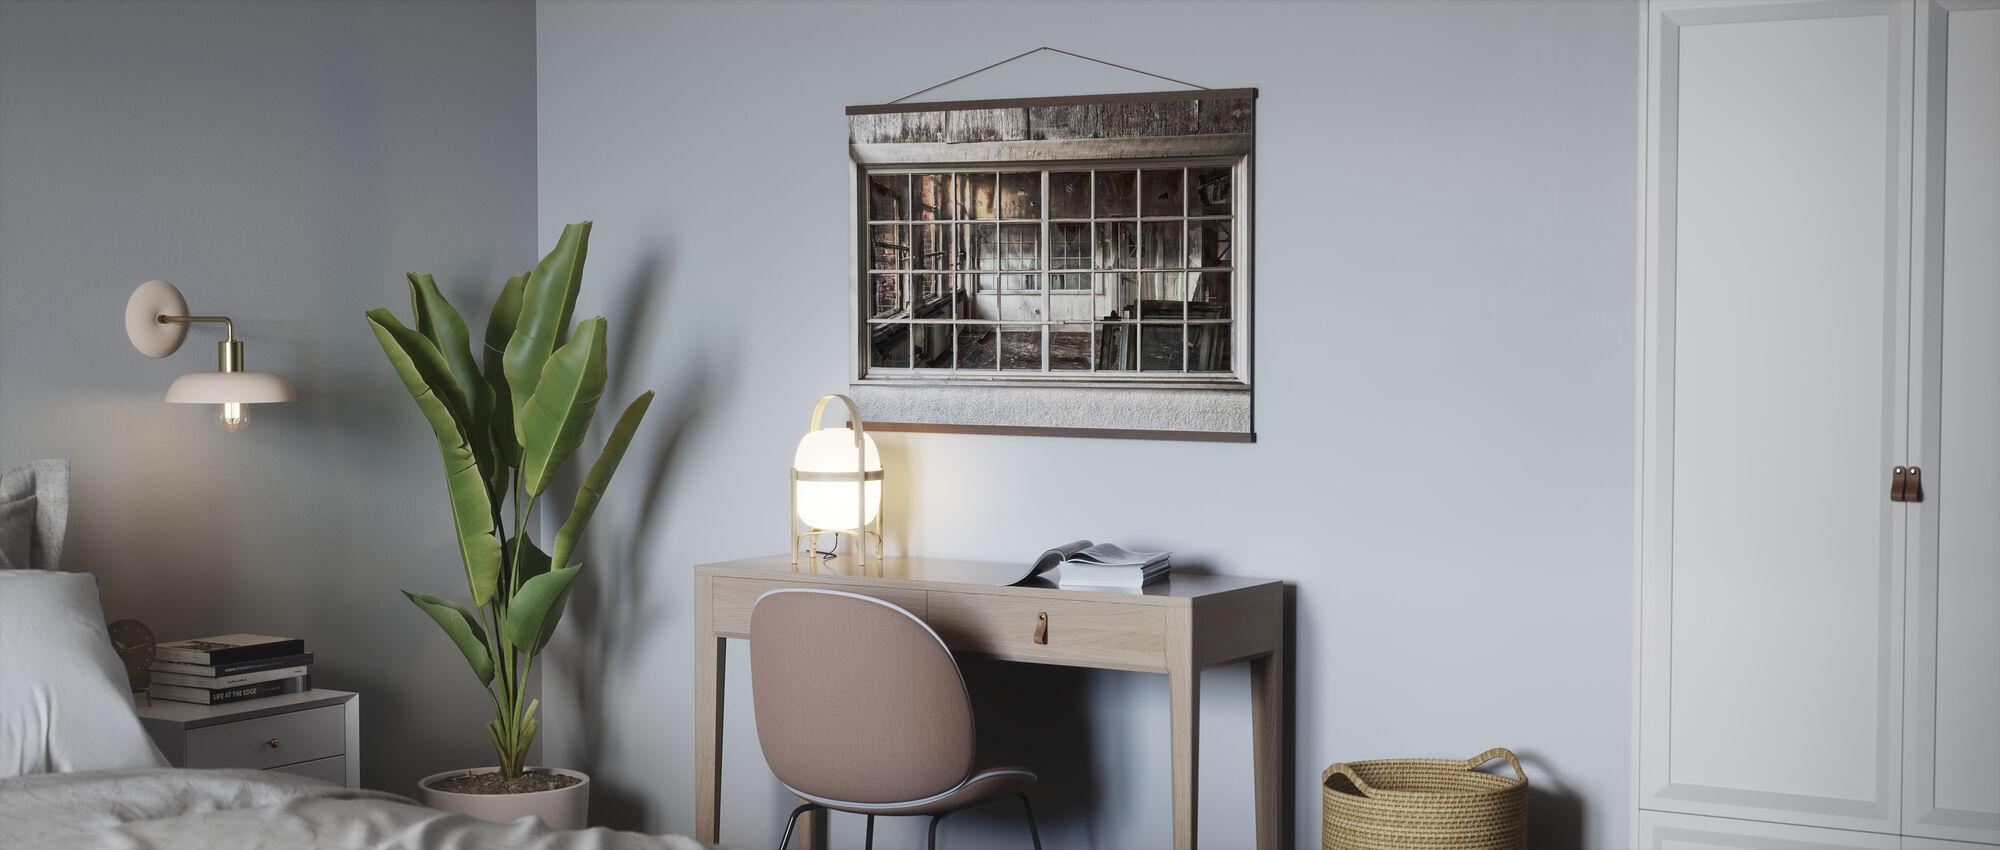 Zerbrochenes altes Fenster - Poster - Büro